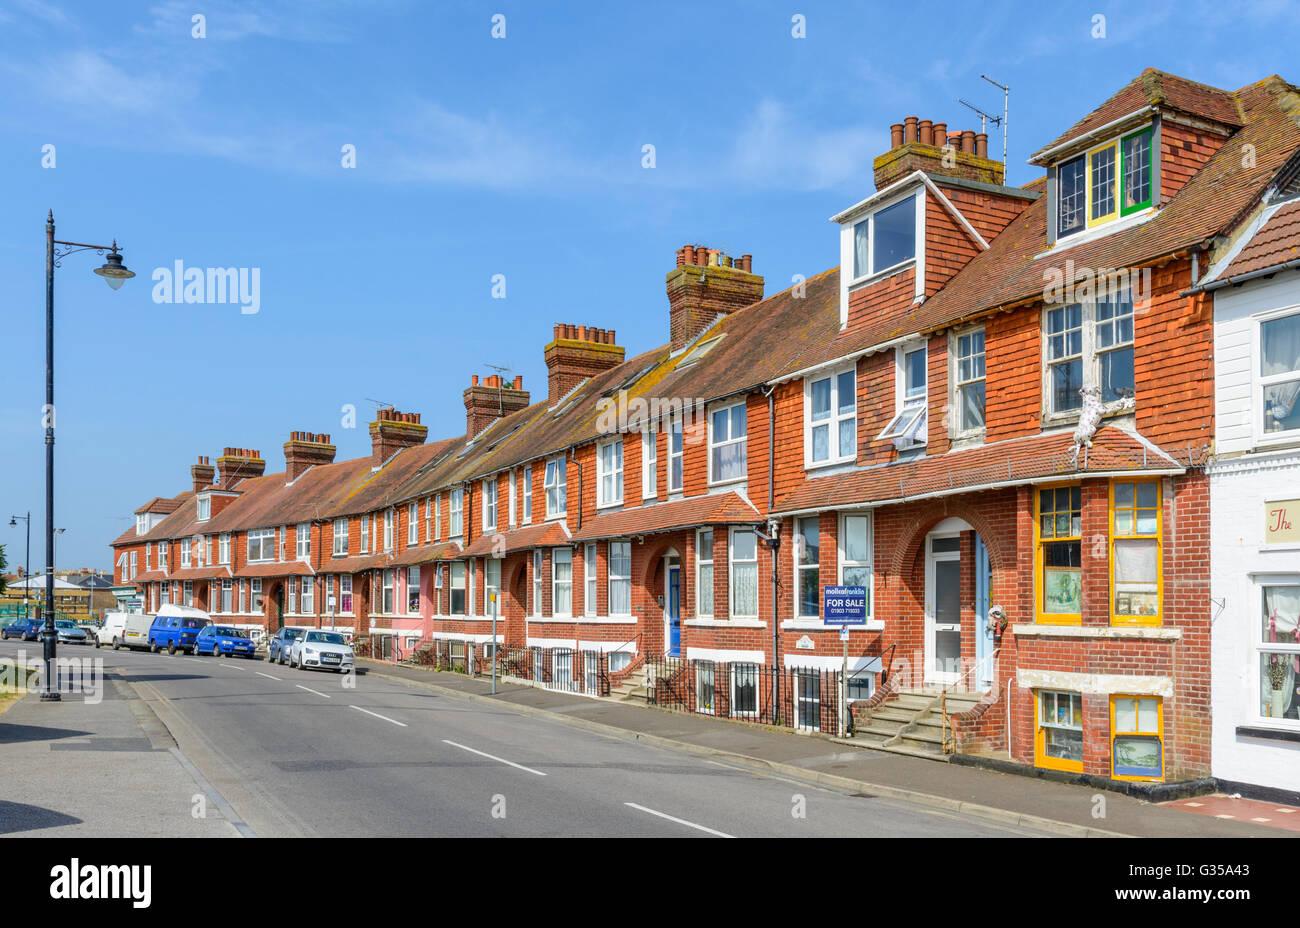 Maisons mitoyennes dans Pier Road, Littlehampton, West Sussex, Angleterre, Royaume-Uni. Photo Stock